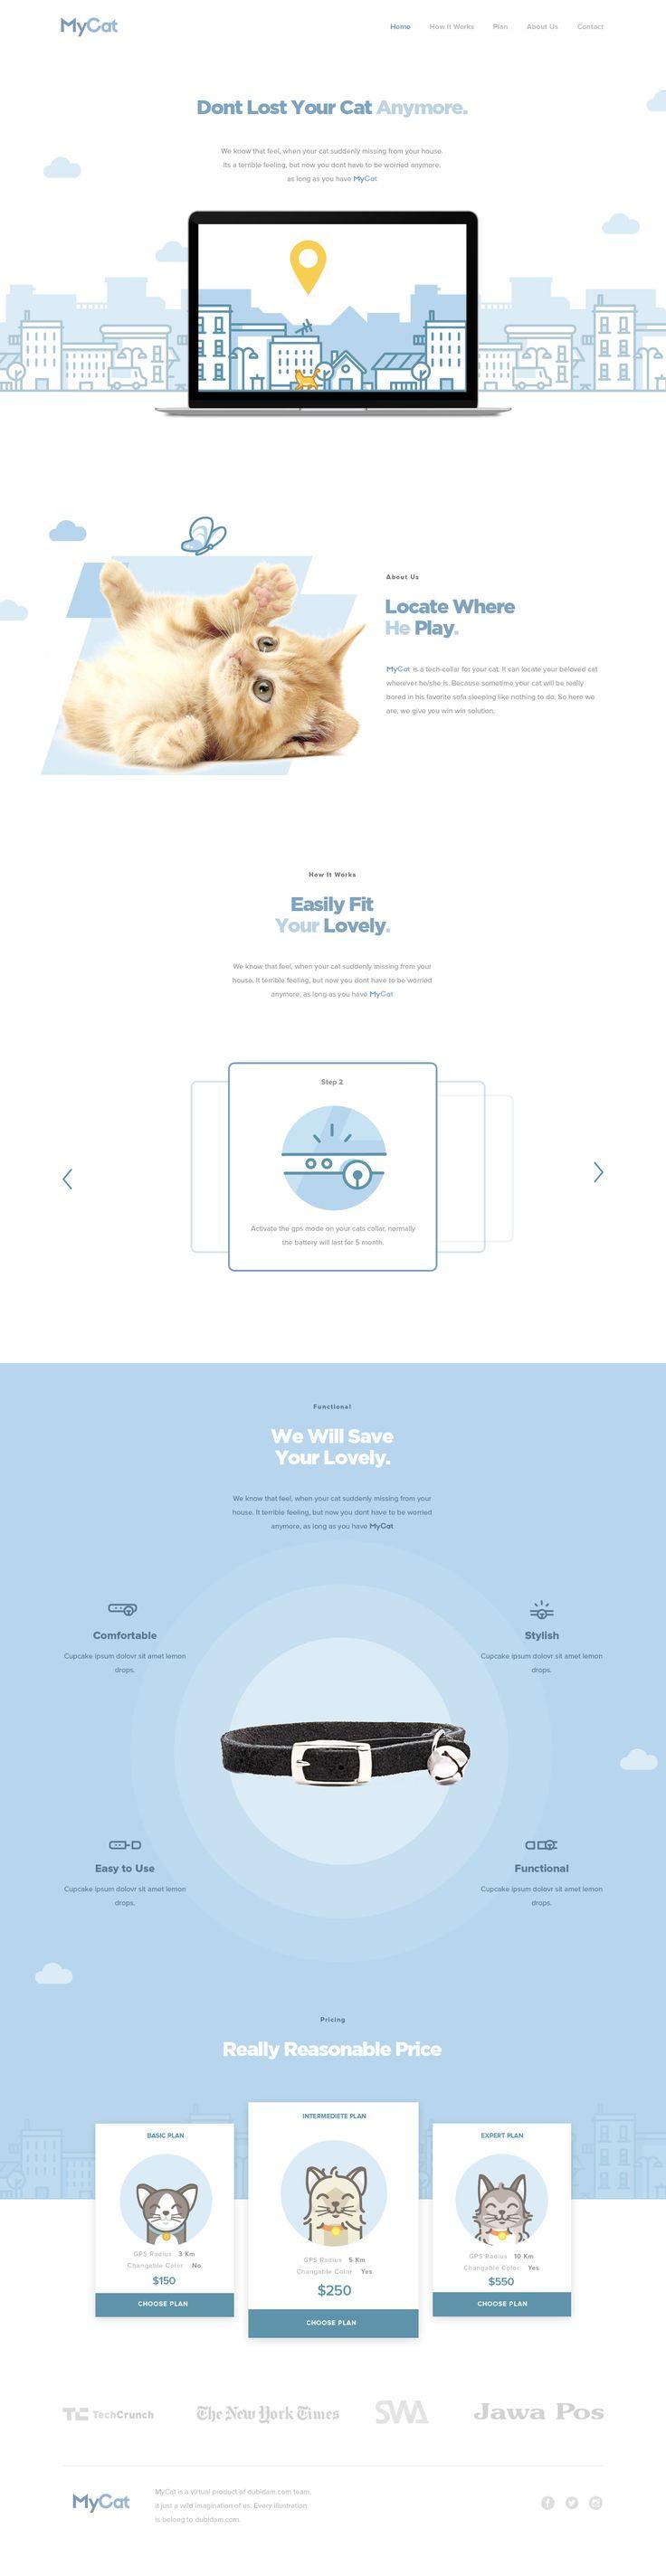 MyCat - Free Landing Page